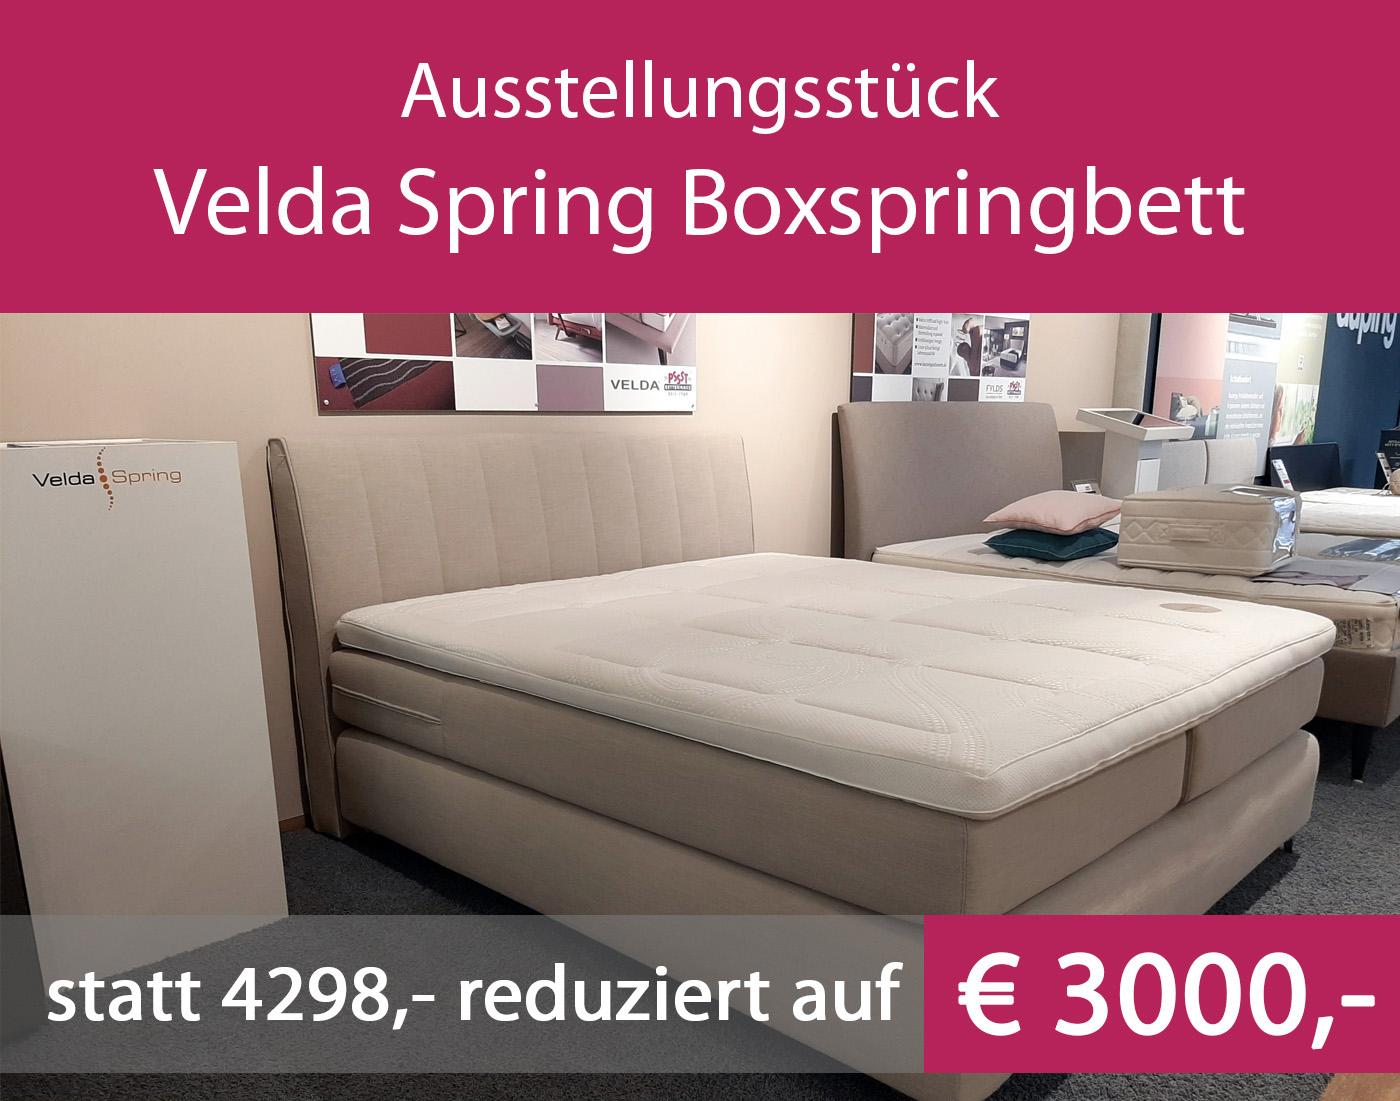 Ausstellungsstück Velda Spring 3C Pulse Boxspringbett